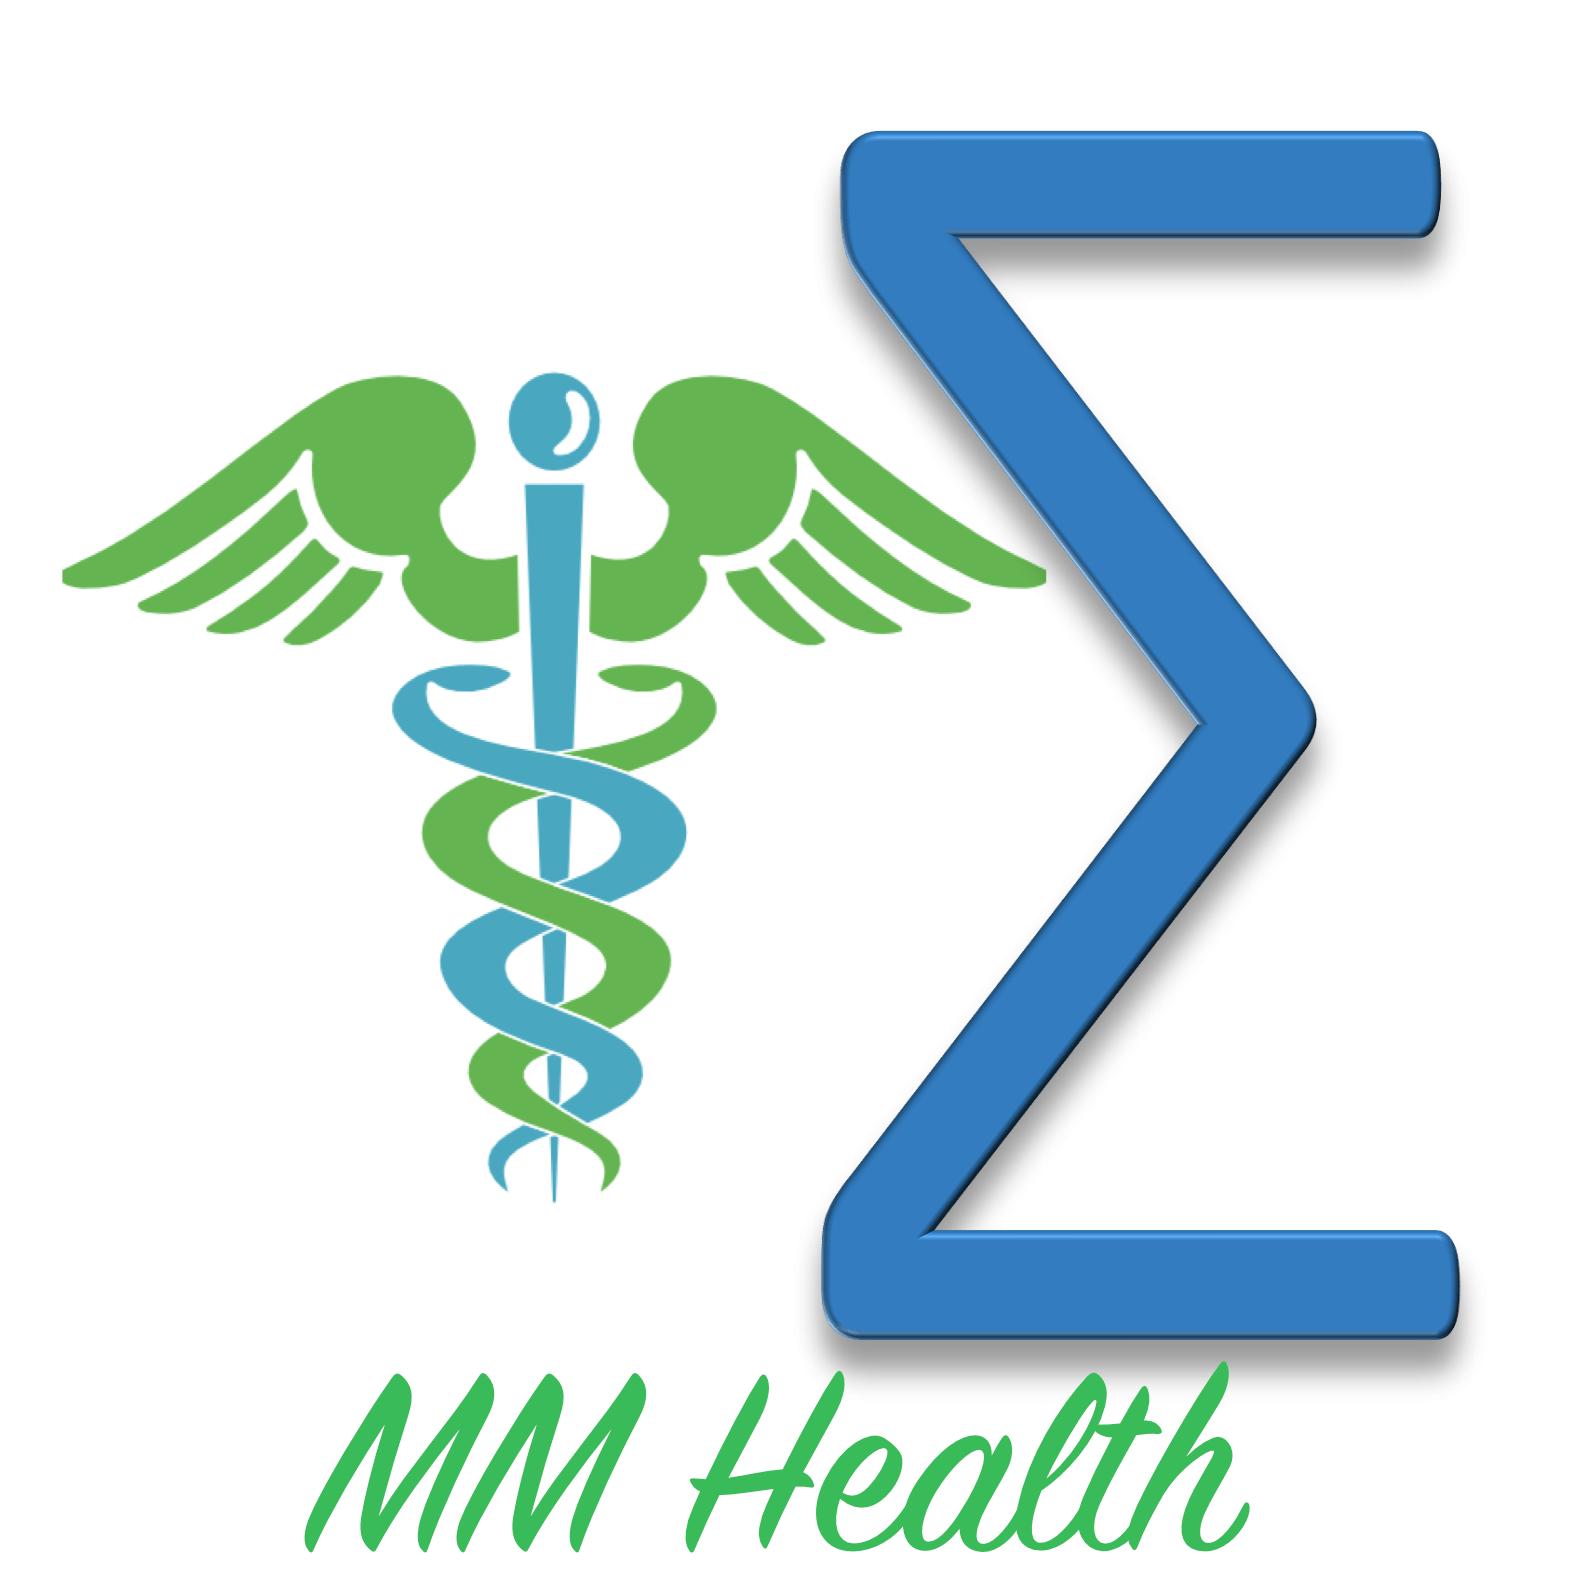 MM Health Podcast, 1 November 2020